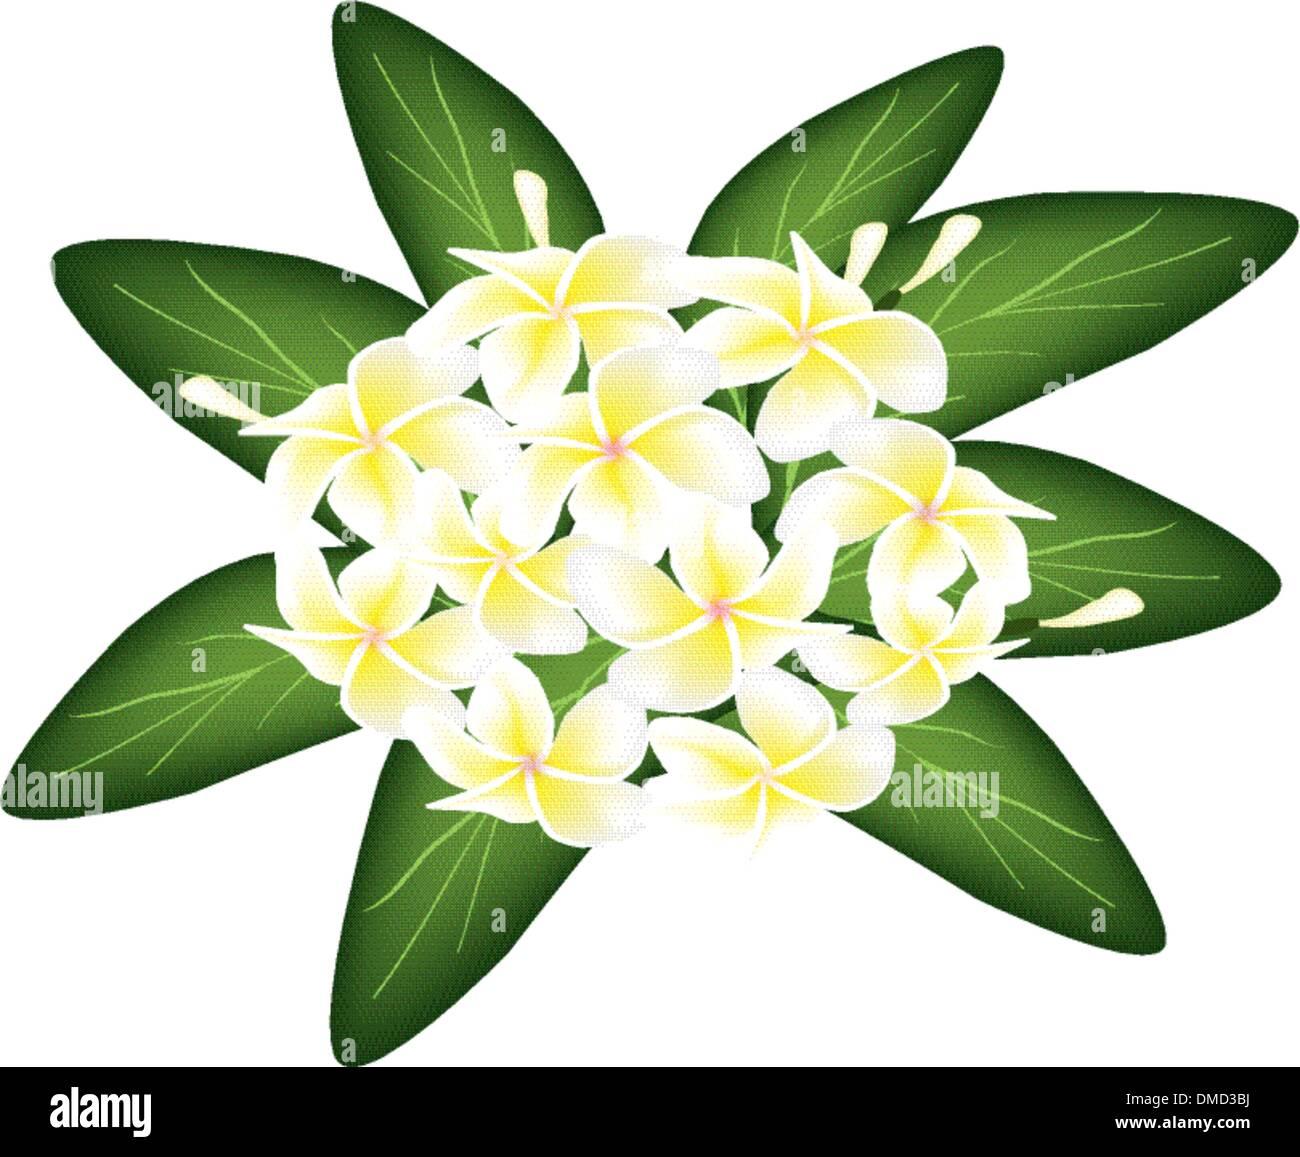 A Group of White Beauty Plumeria Frangipanis - Stock Vector